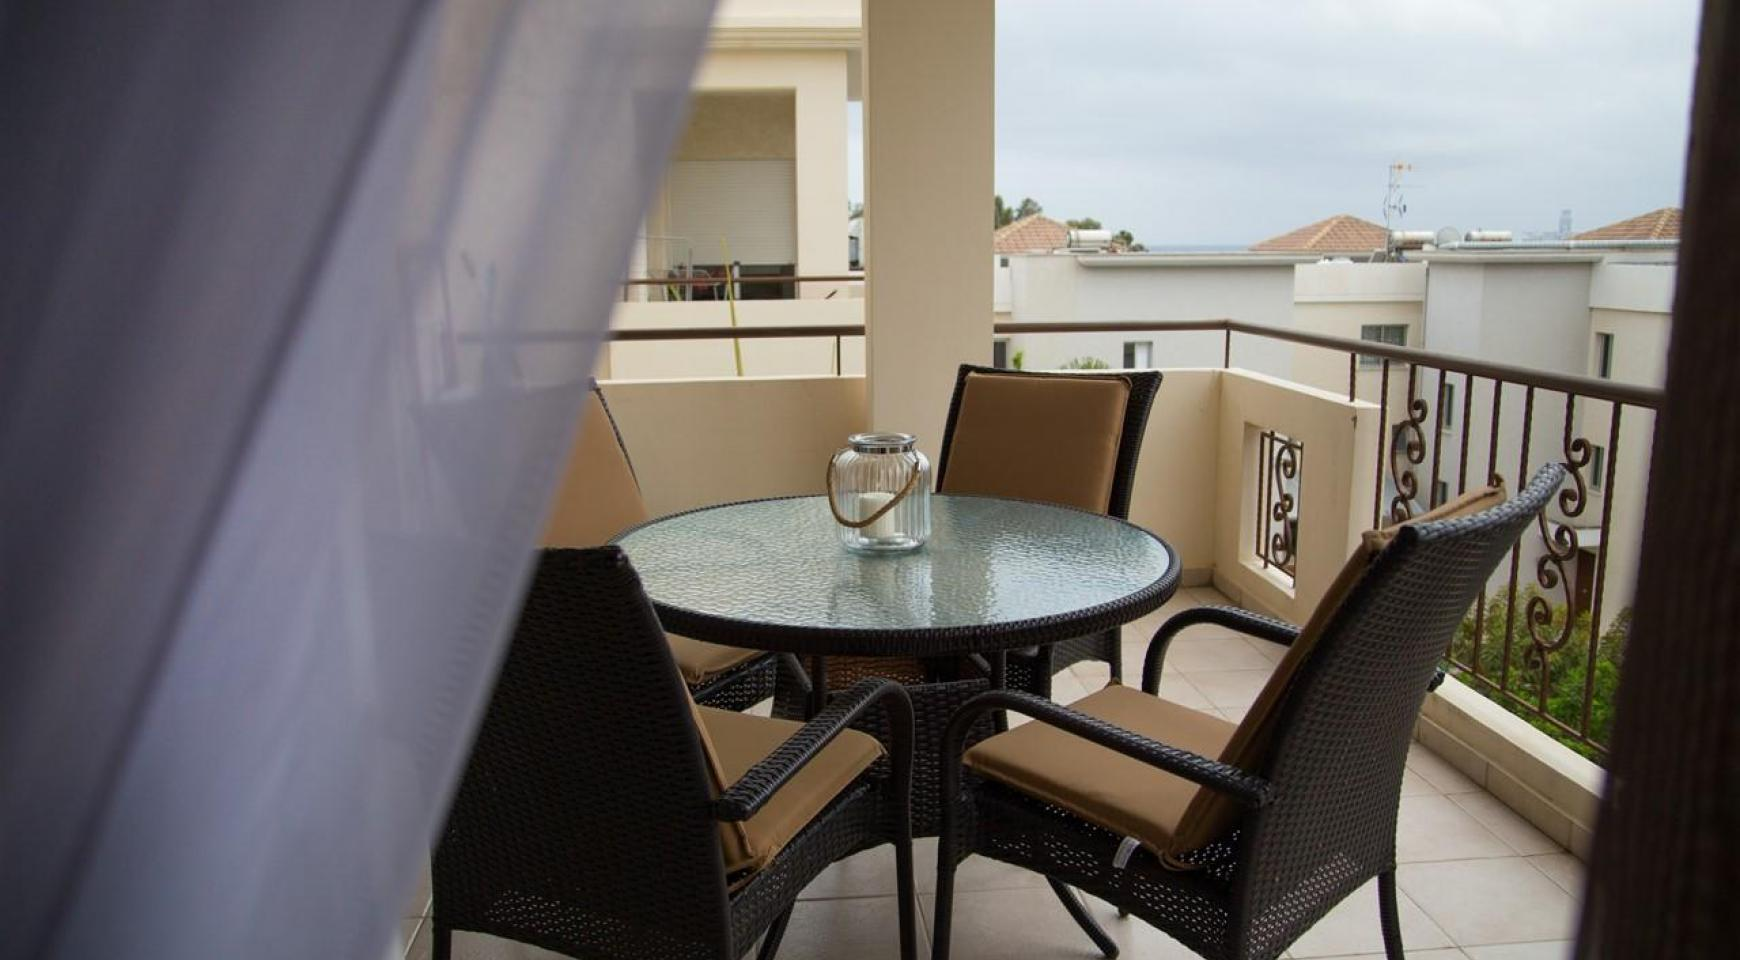 Luxury 2 Bedroom Apartment Mesogios Iris 304 in the Tourist area near the Beach - 25